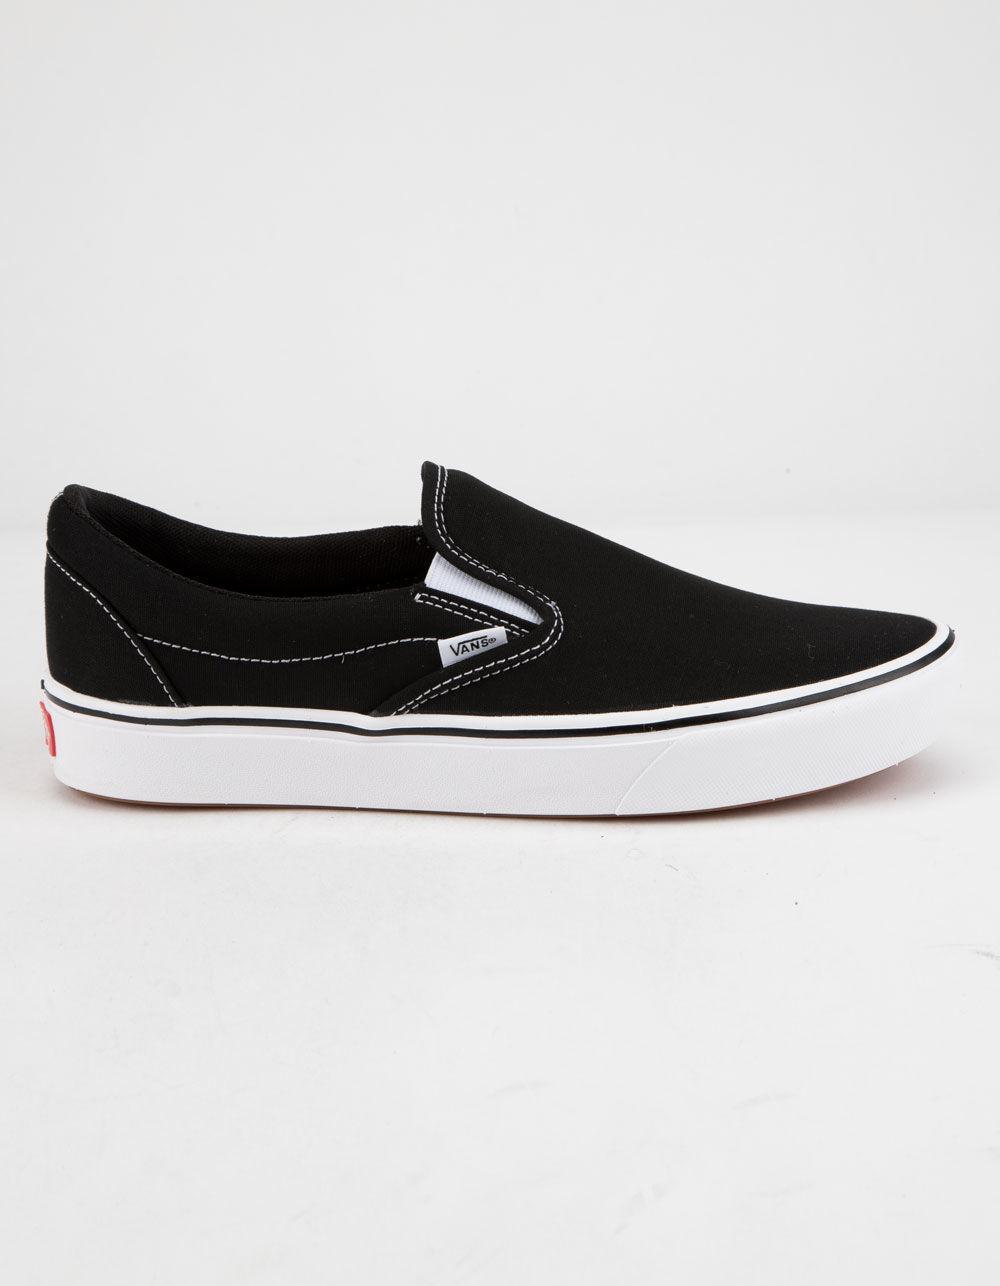 d7bb4c3ff41 Vans - Comfycush Classic Slip-on Black   True White Shoes - Lyst. View  fullscreen